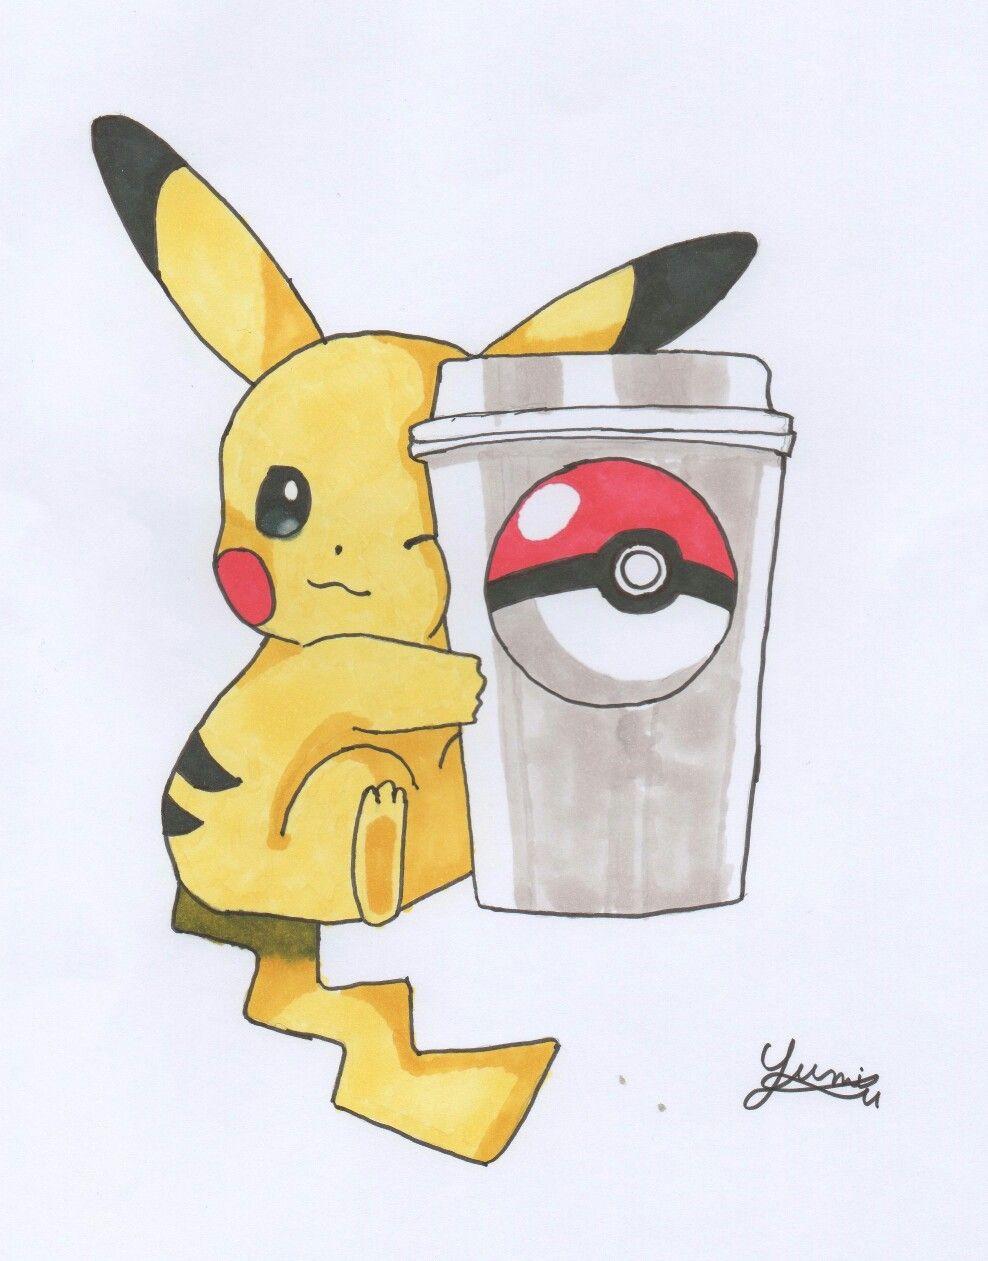 Pikachu Termine Encre Pikachu Drawing Pokemon Pikachu